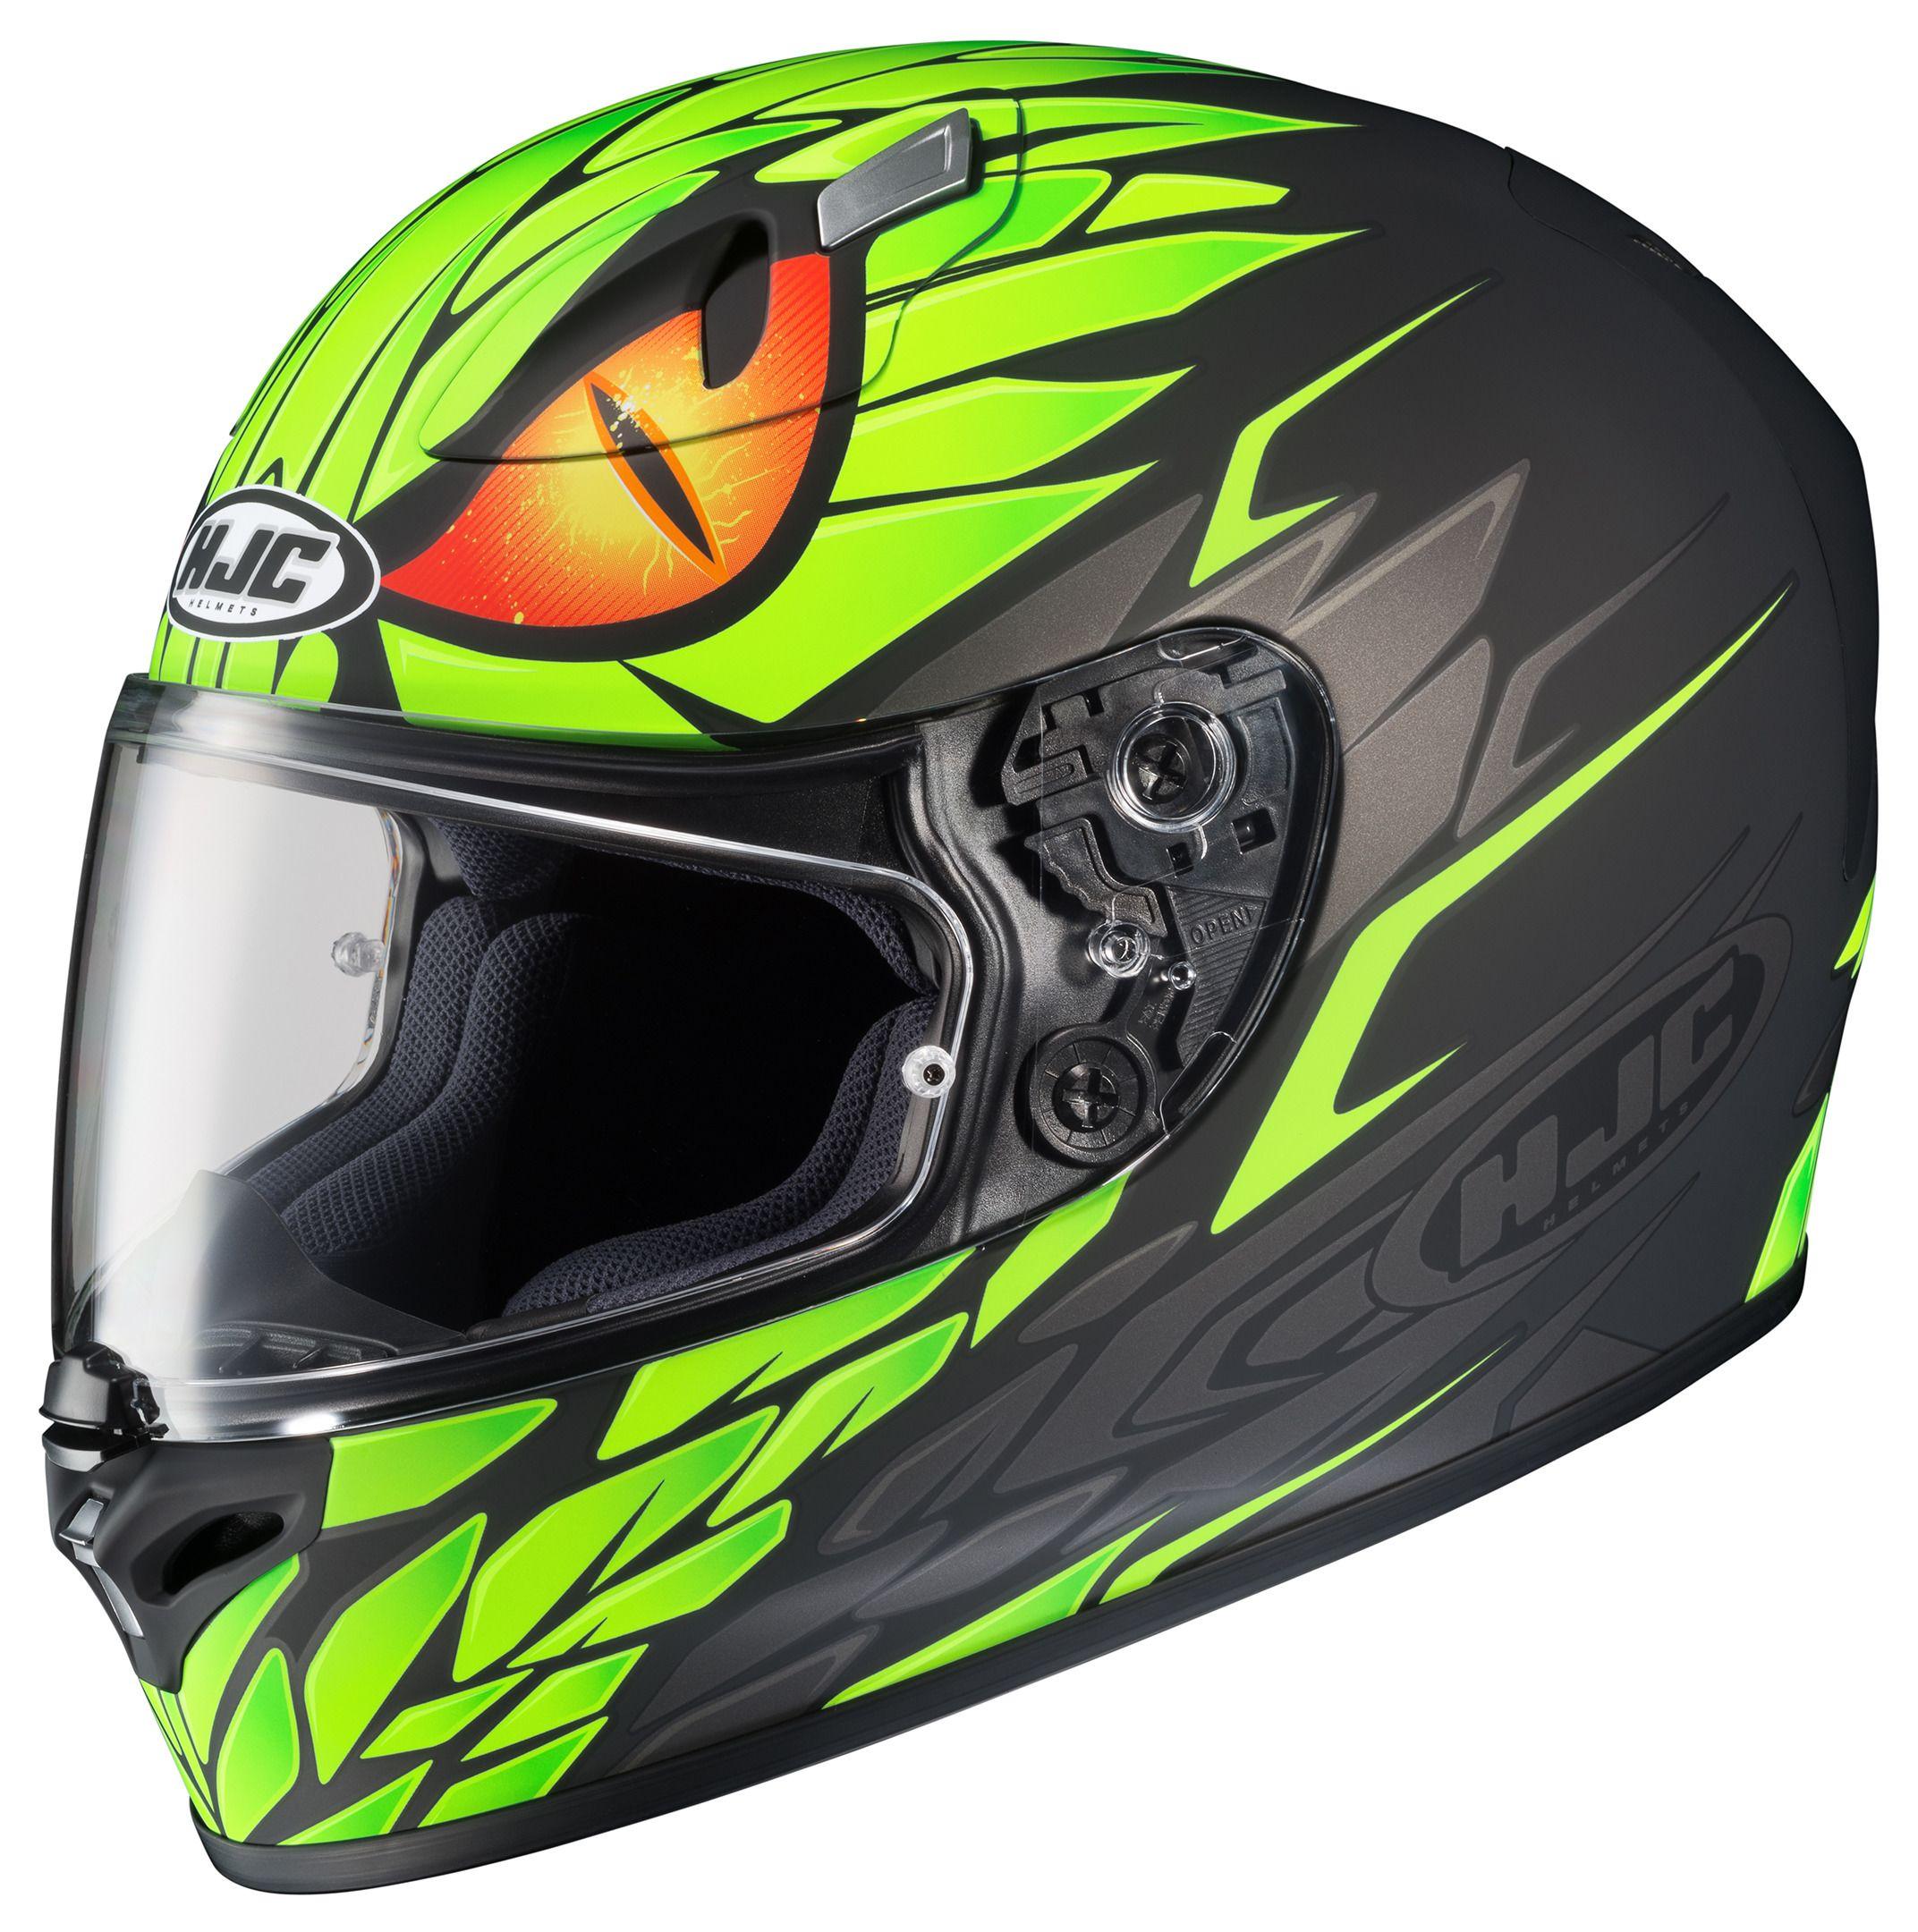 hjc fg 17 lorenzo mamba helmet size lg only revzilla. Black Bedroom Furniture Sets. Home Design Ideas